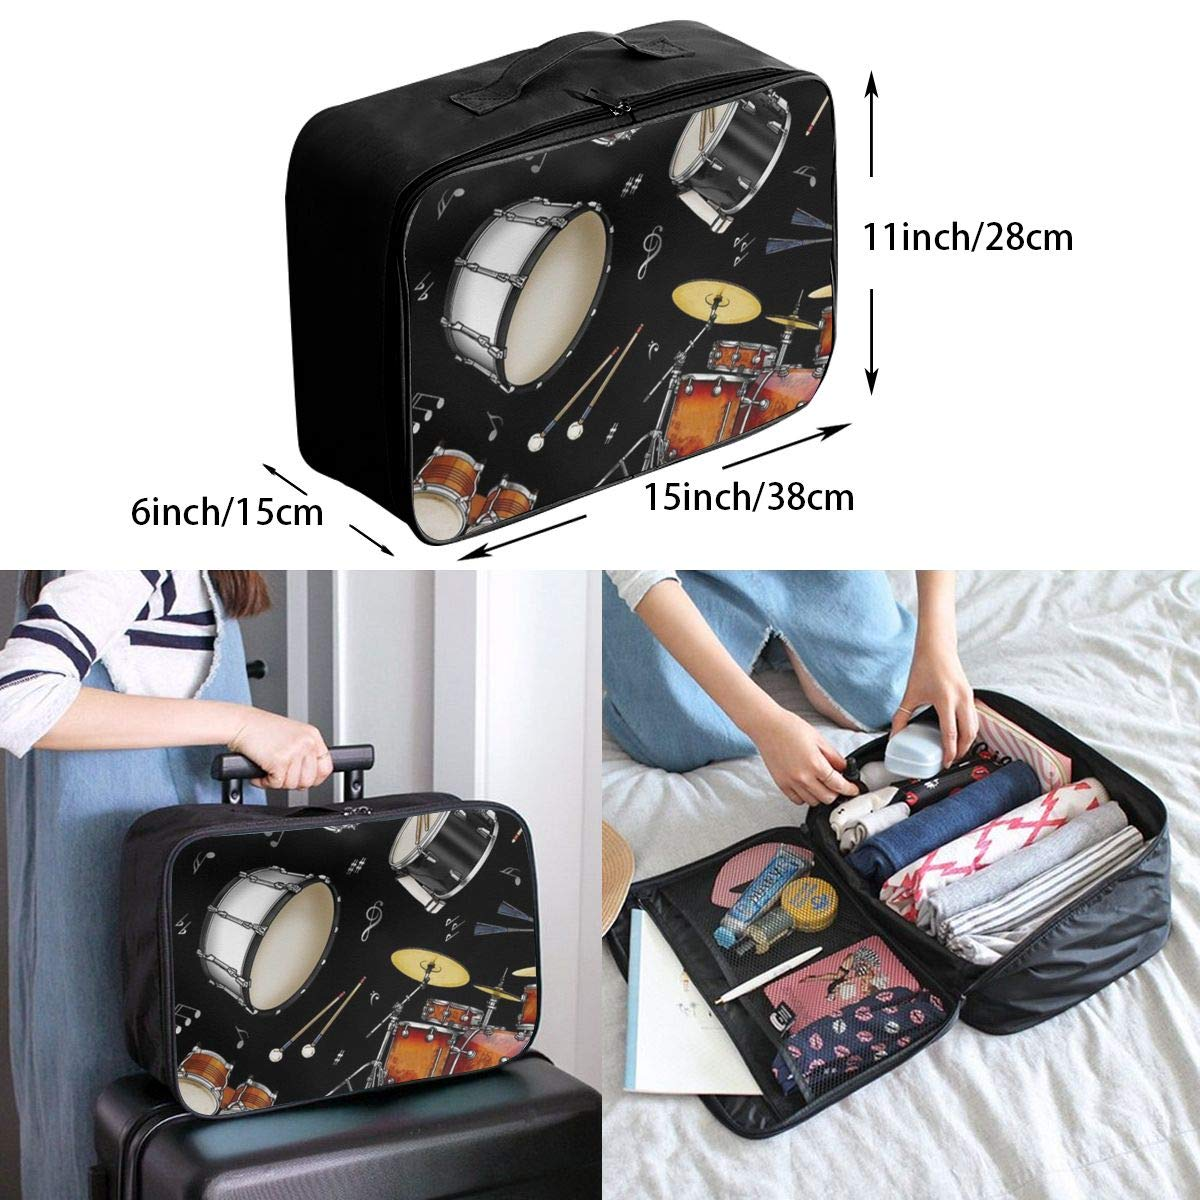 Rock Drum Stand Travel Duffel Bag Casual Large Capacity Portable Luggage Bag Suitcase Storage Bag Luggage Packing Tote Bag Weekend Trip